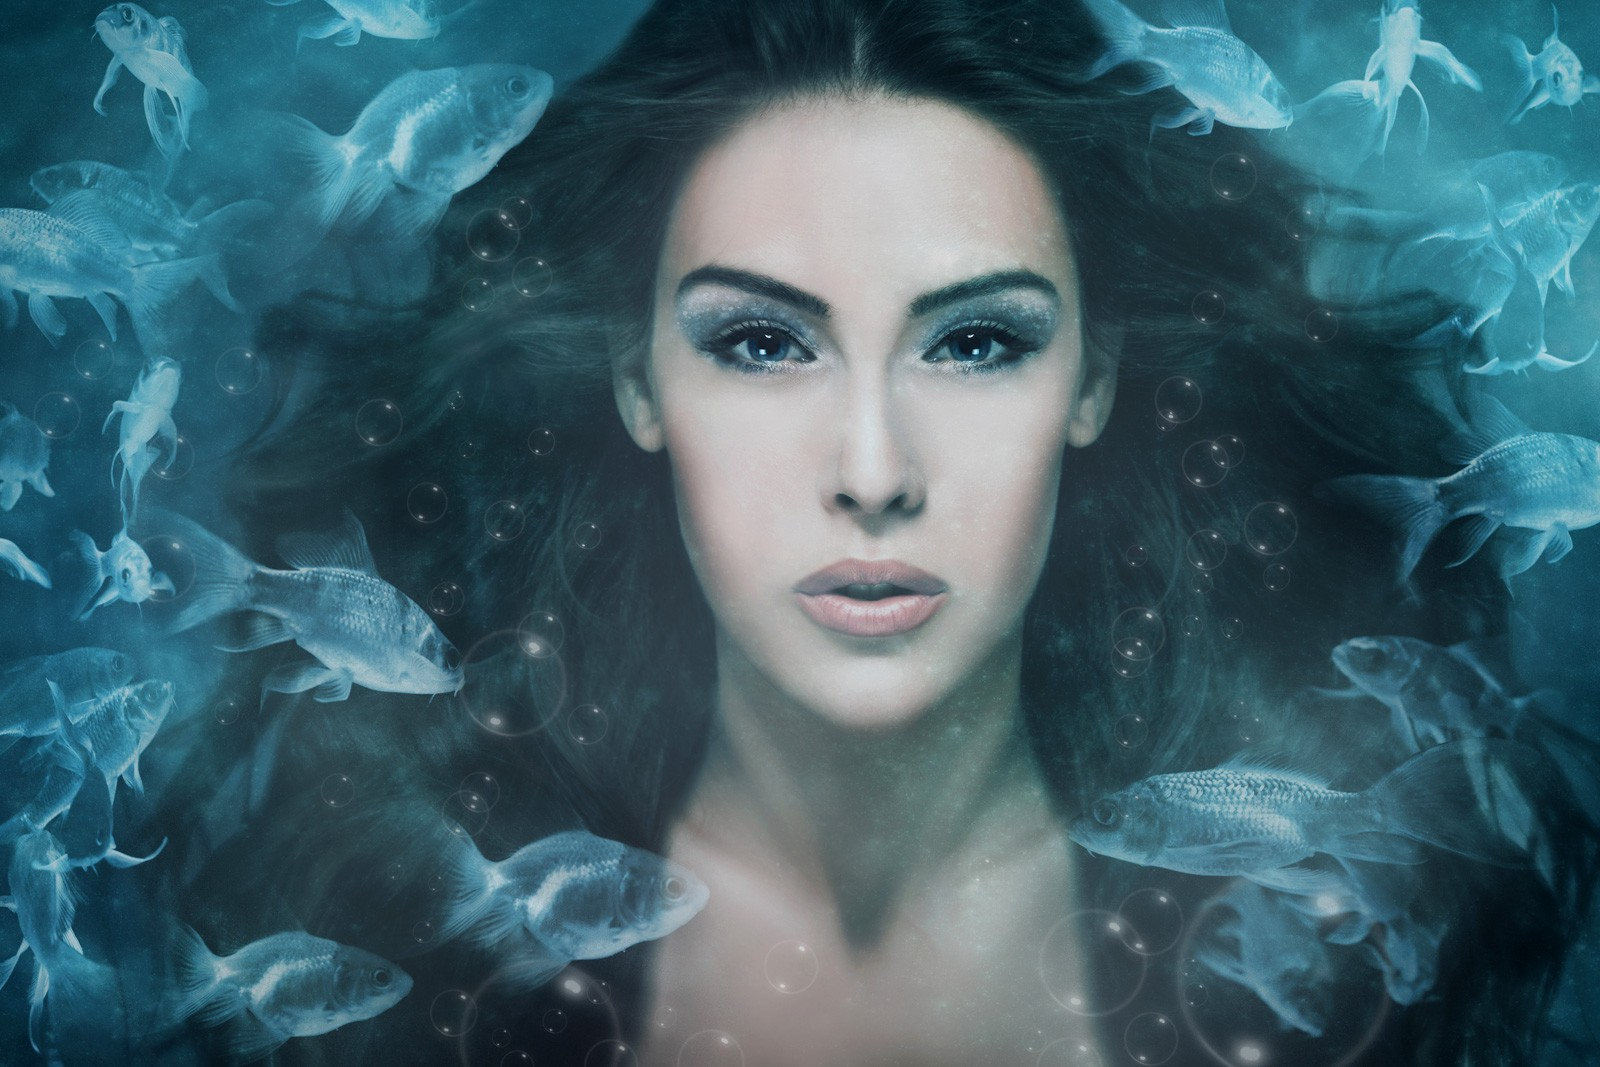 Undines: Water Elementals